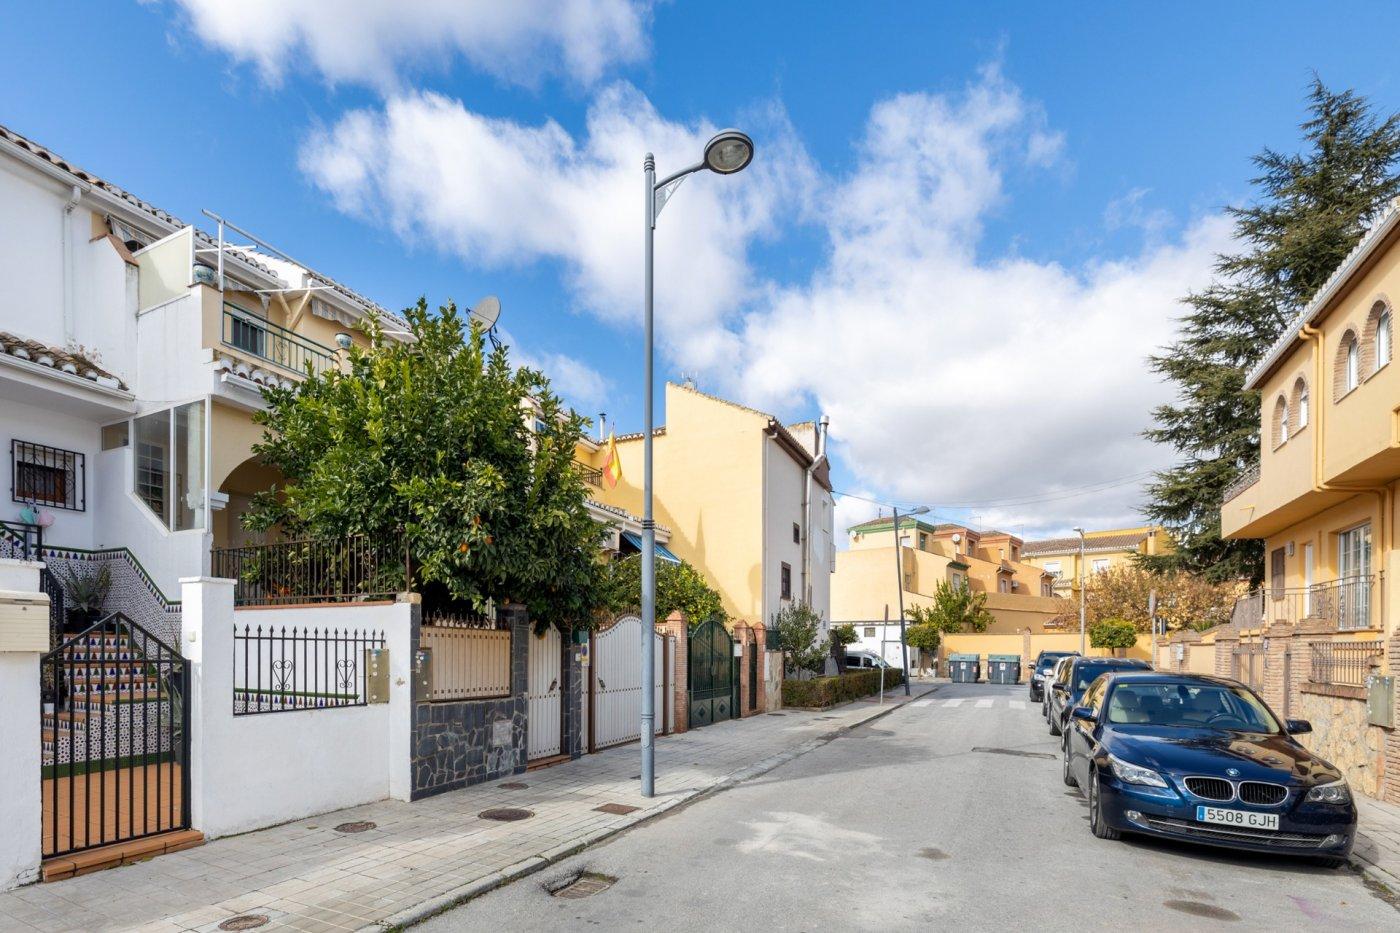 Casa Adosada bien situada en Santa Fe - Granada, Granada